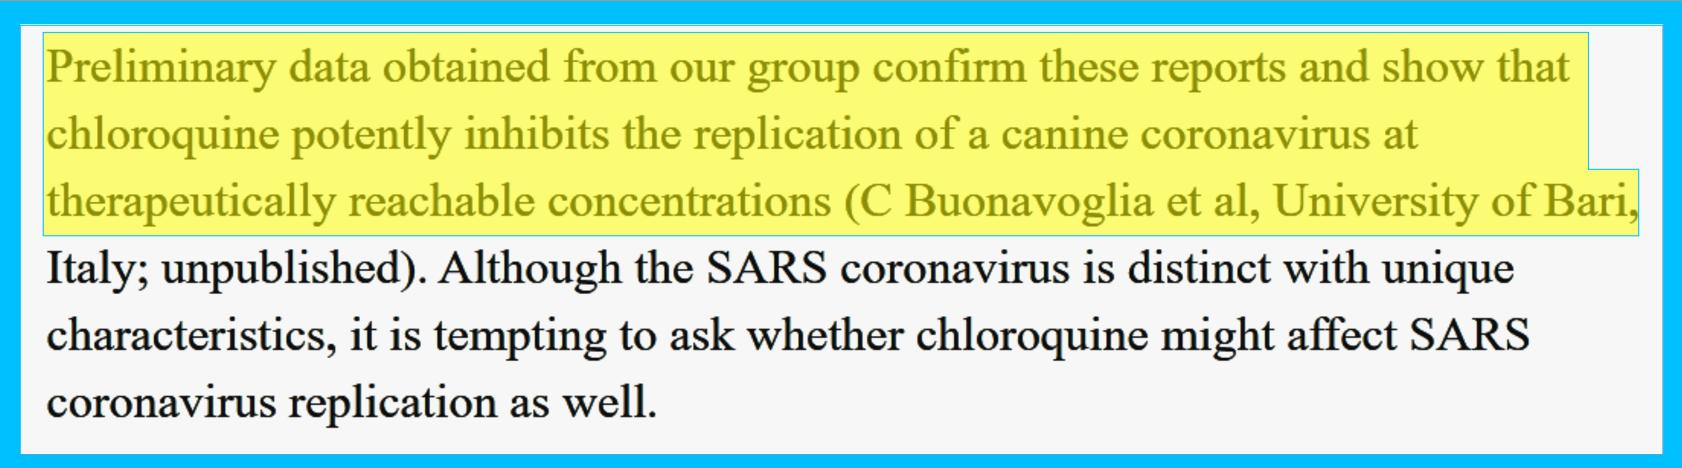 .#HCQ #SARSCOV #QPlusNews #Q